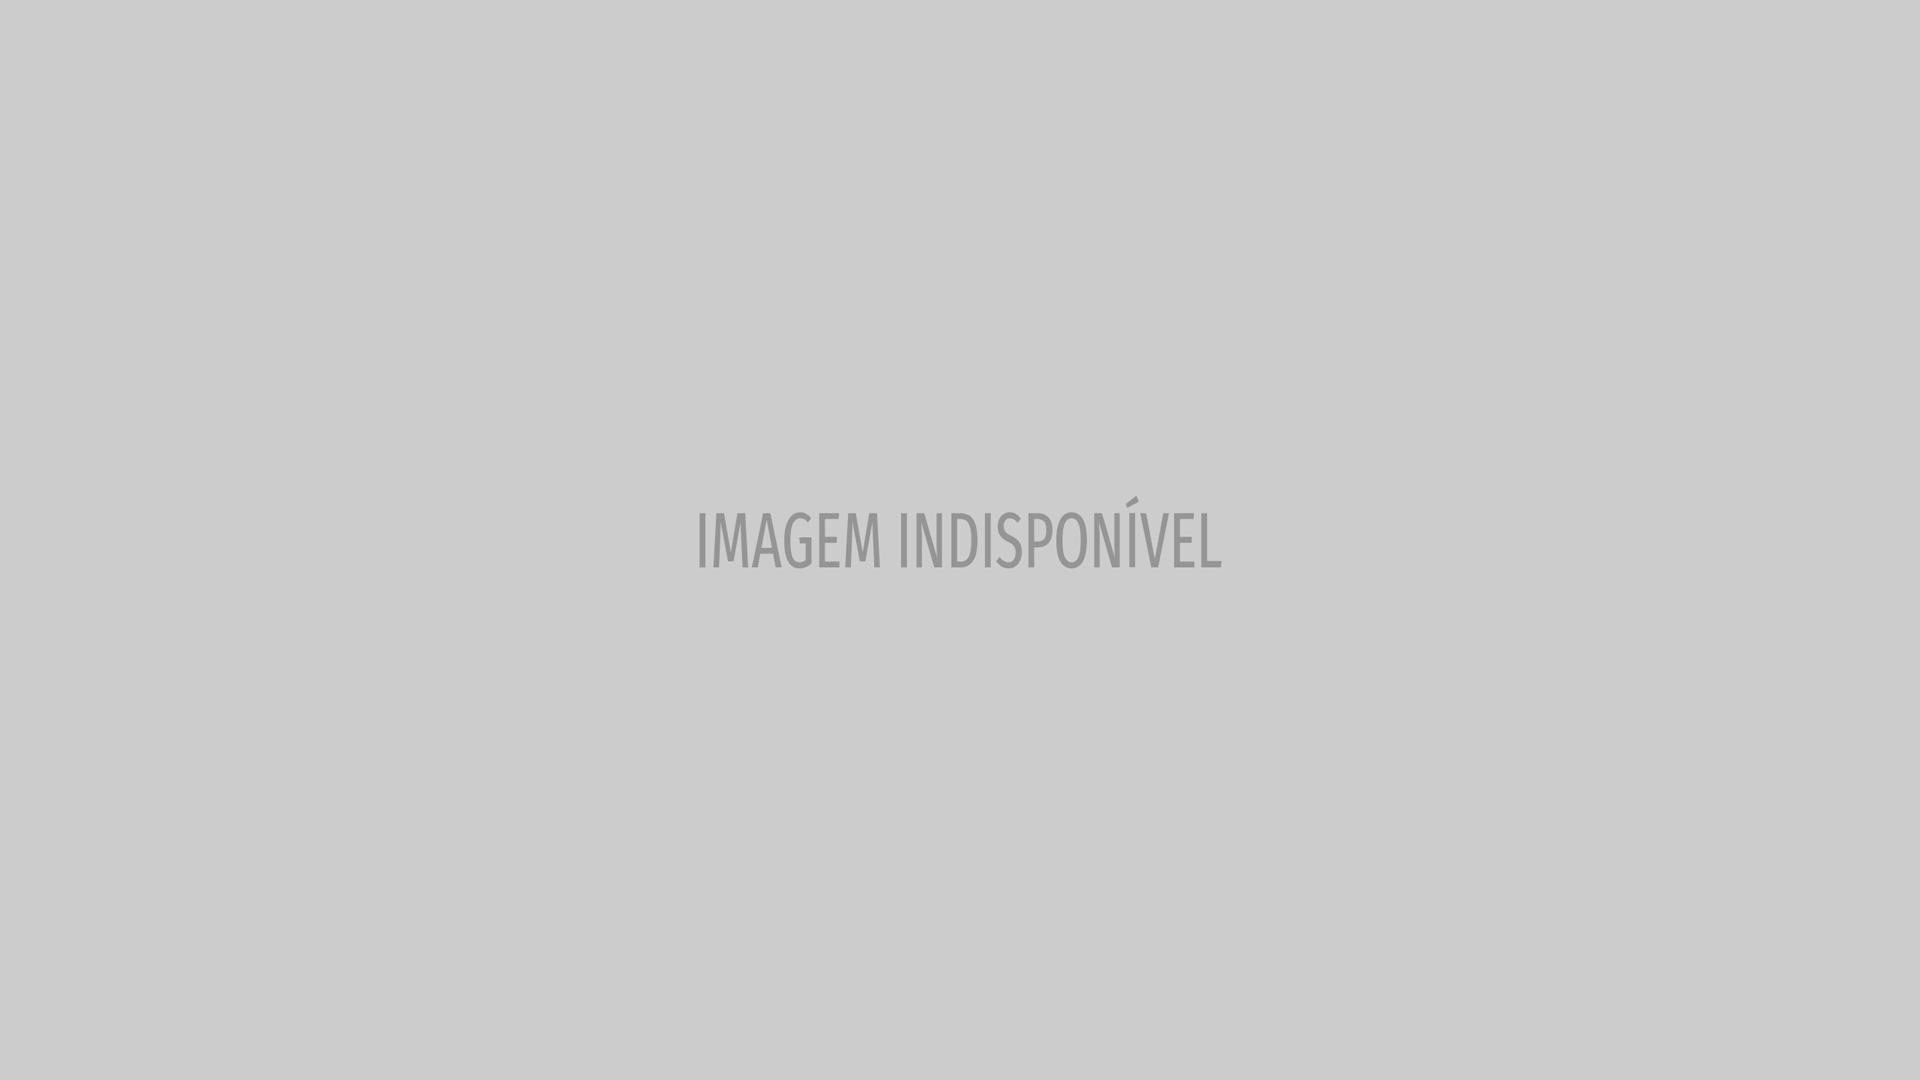 Inesperadamente, Justin Bieber homenageia 'ex' Selena Gomez